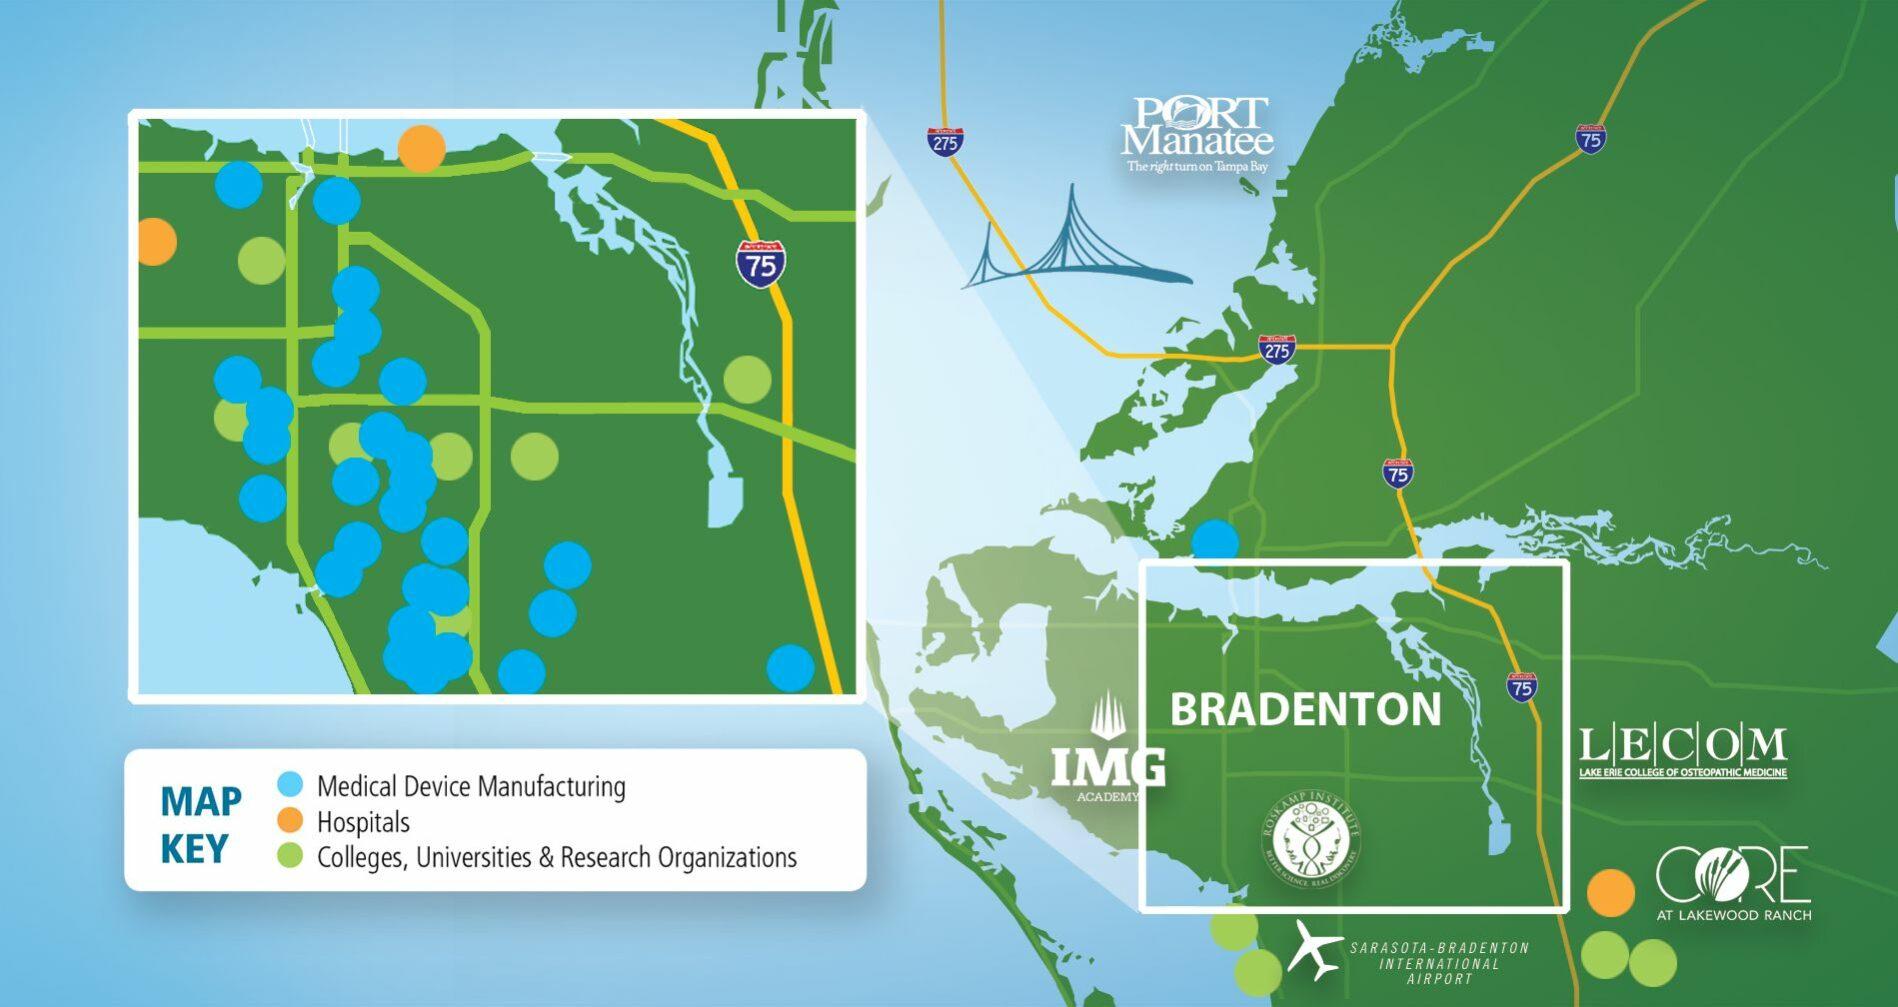 Bradenton Area map of Life Sciences Facilities